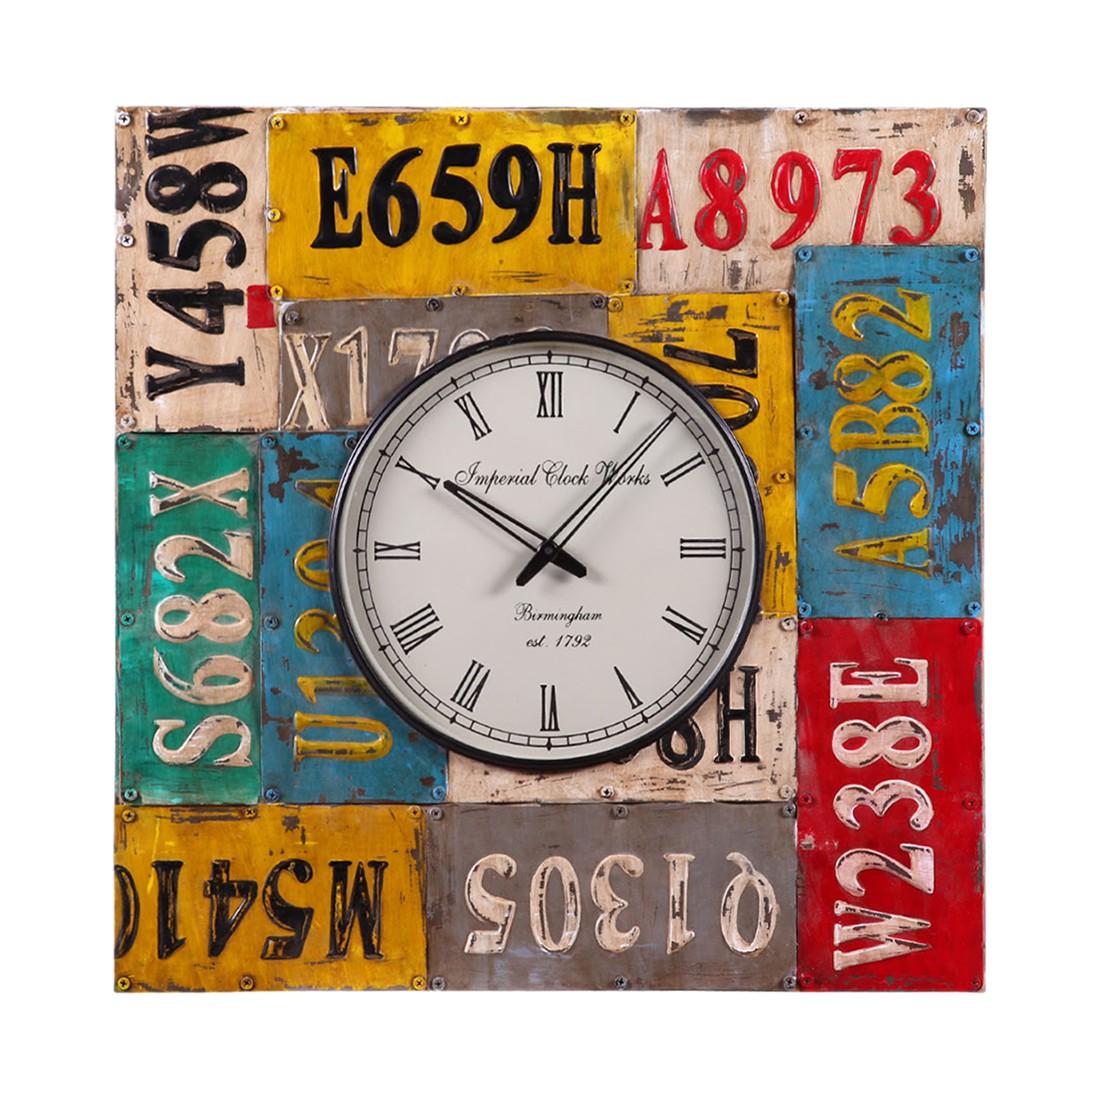 Horloge murale lynton m tallique multicolore ars manufacti par ars manufacti chez home24 fr for Horloge murale multicolore